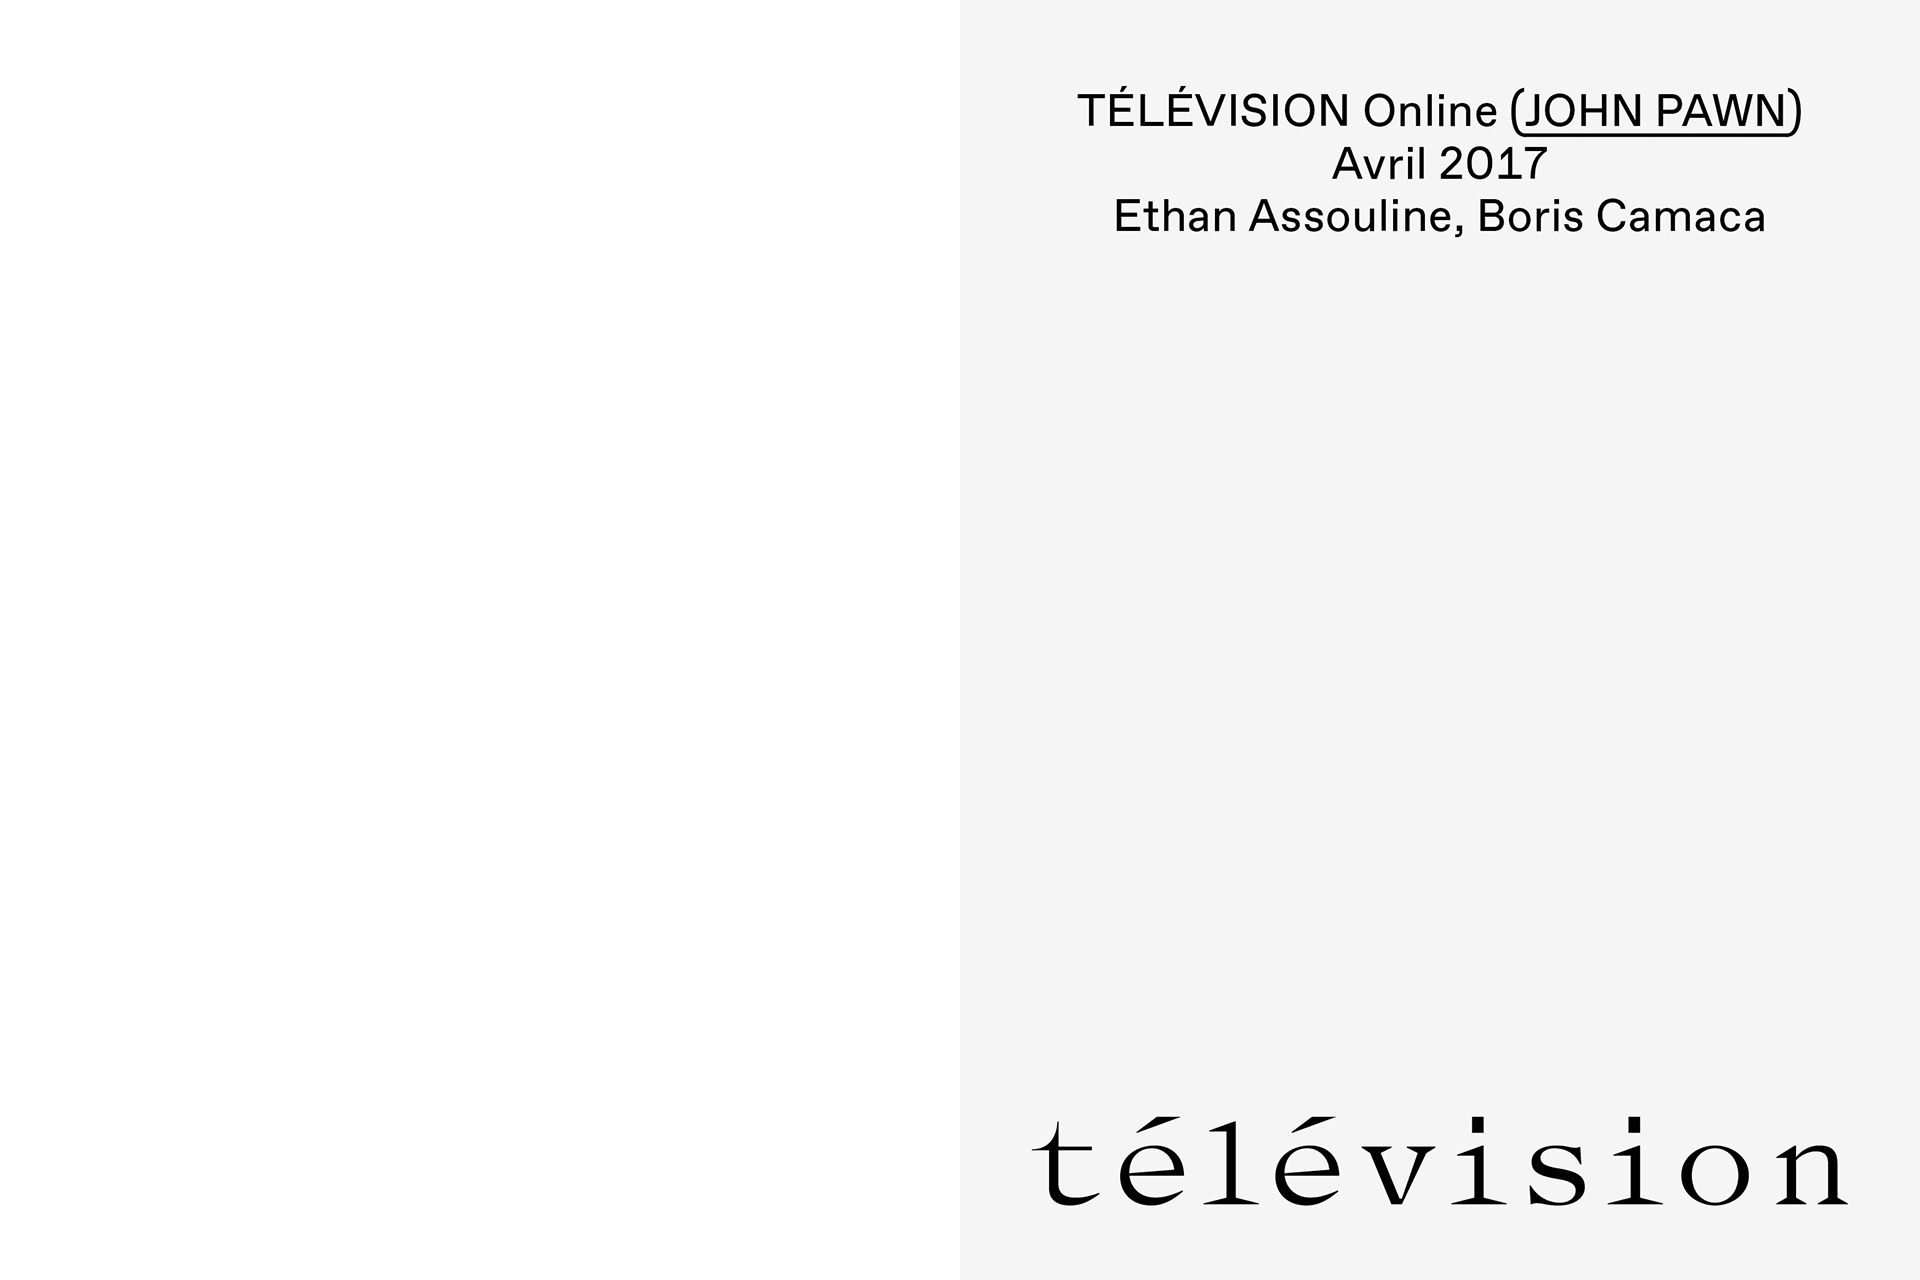 Télévision OL 1701 BC 010 047 JOHNPAWN (BC, EA, MG)